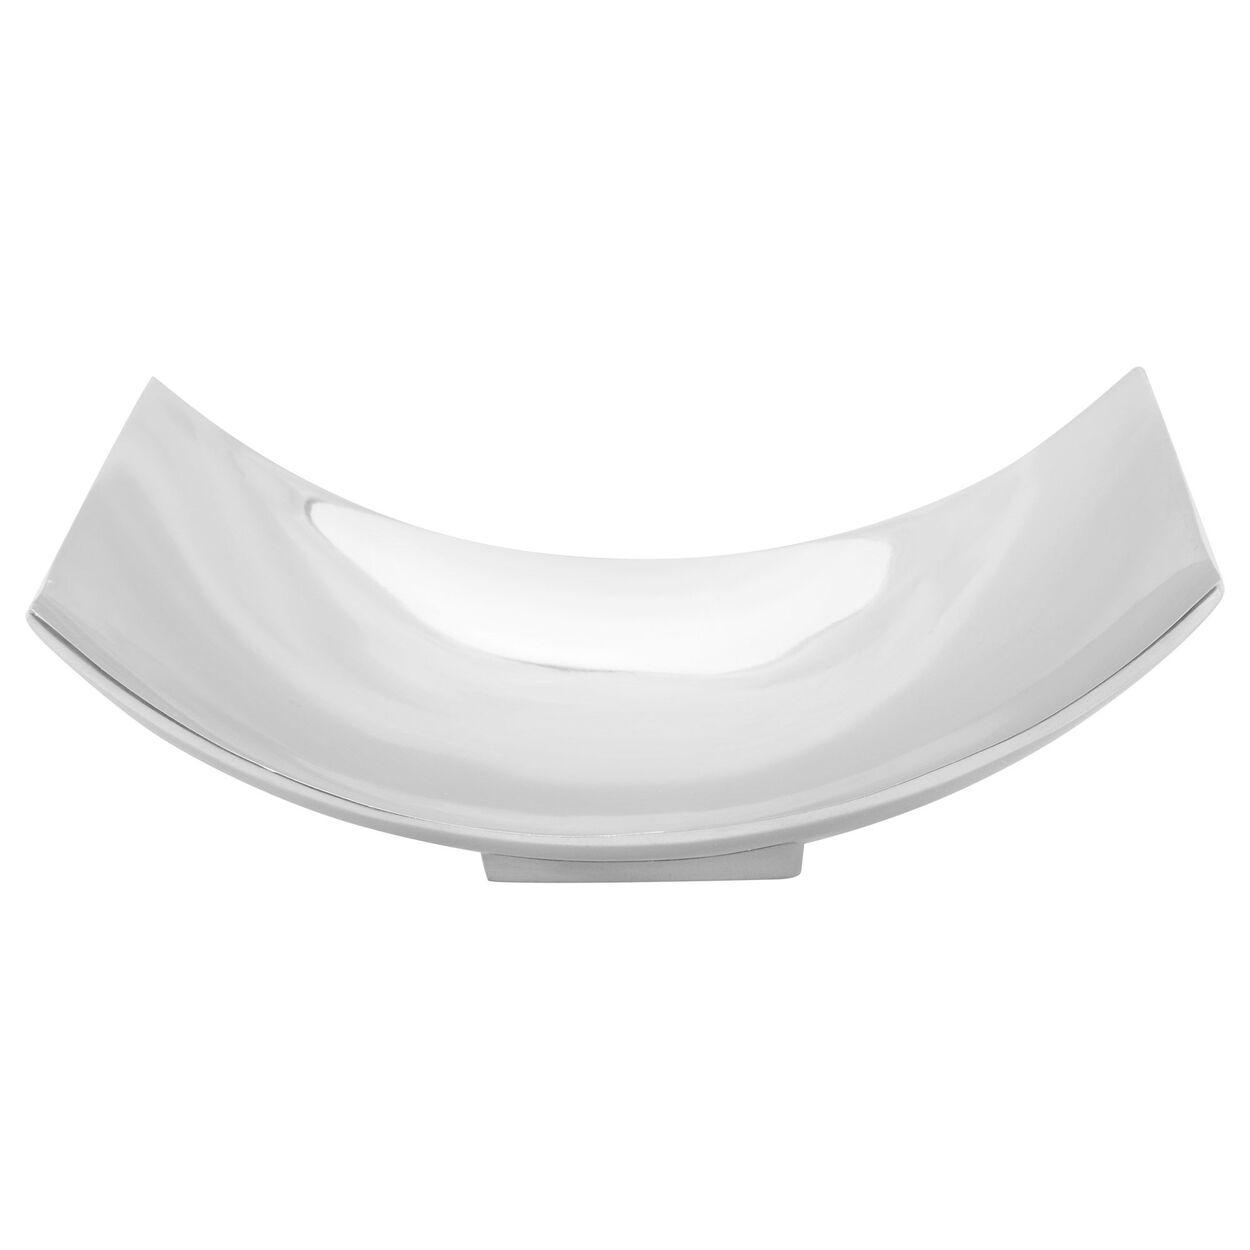 Curved Aluminum Decorative Plate